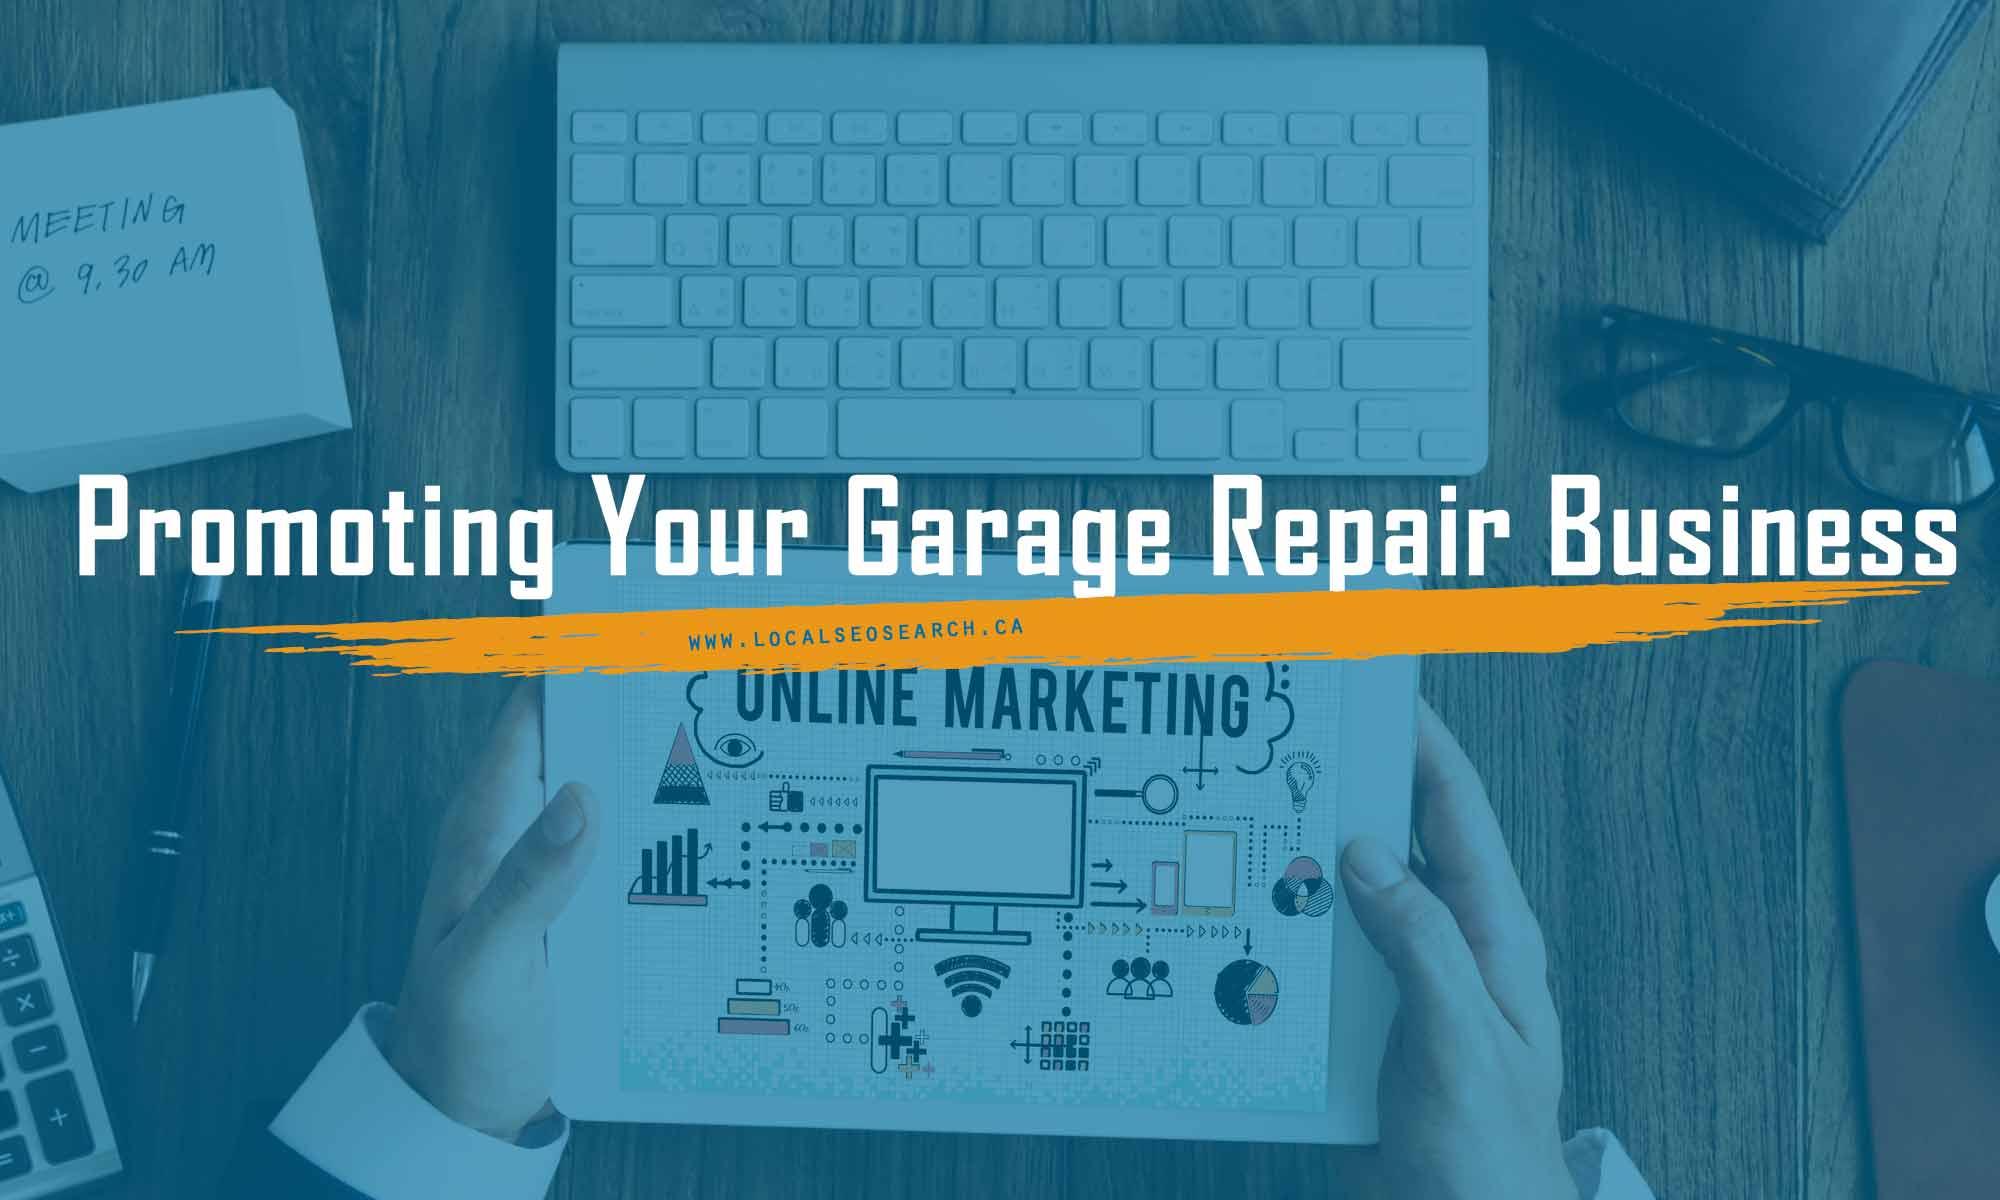 Promoting Your Garage Repair Business